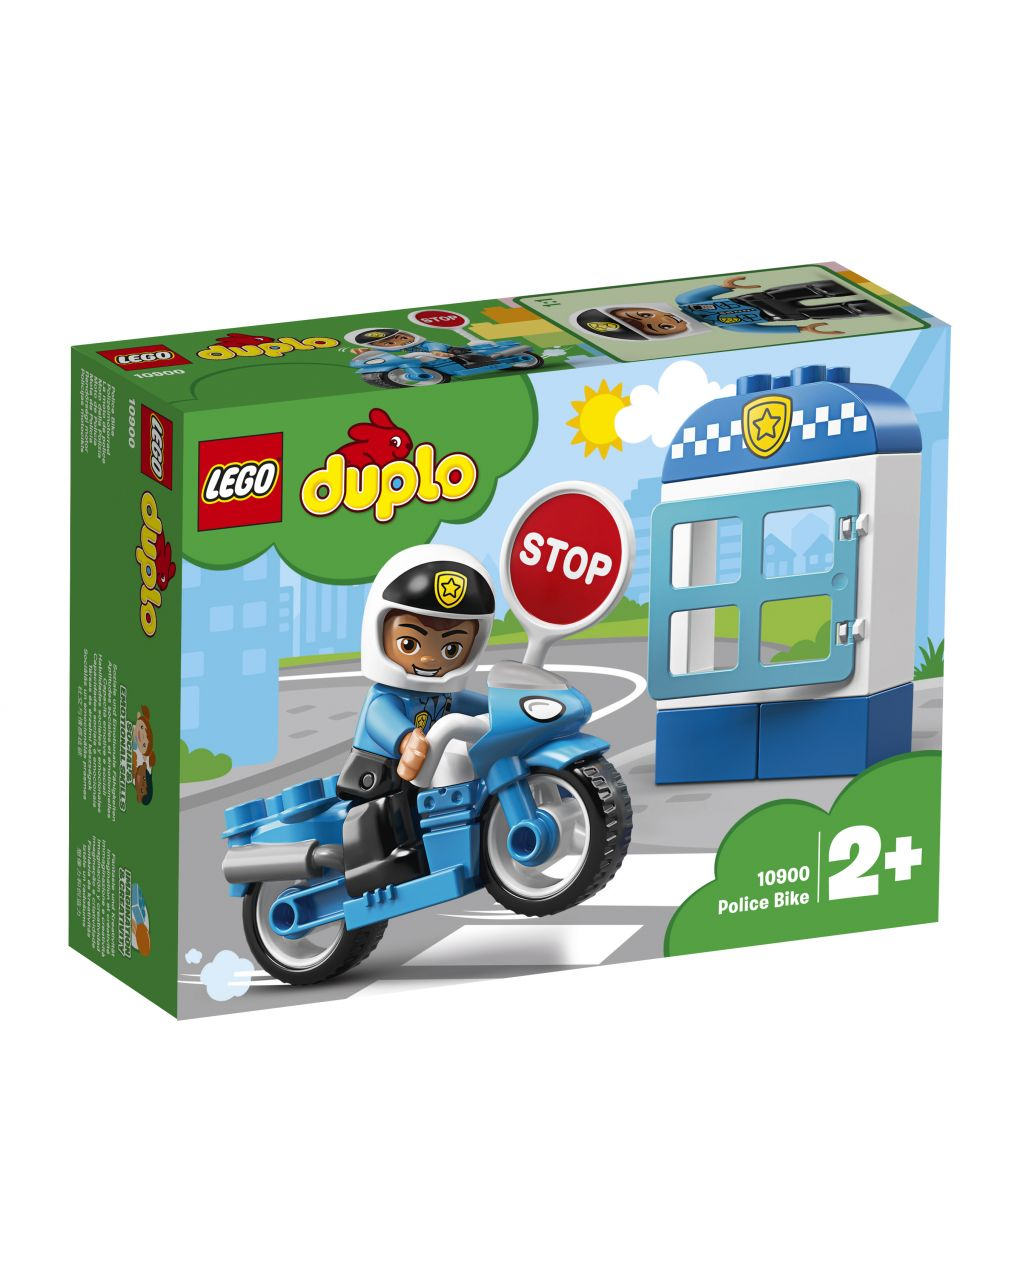 Duplo - moto della polizia - 10900 - LEGO Duplo